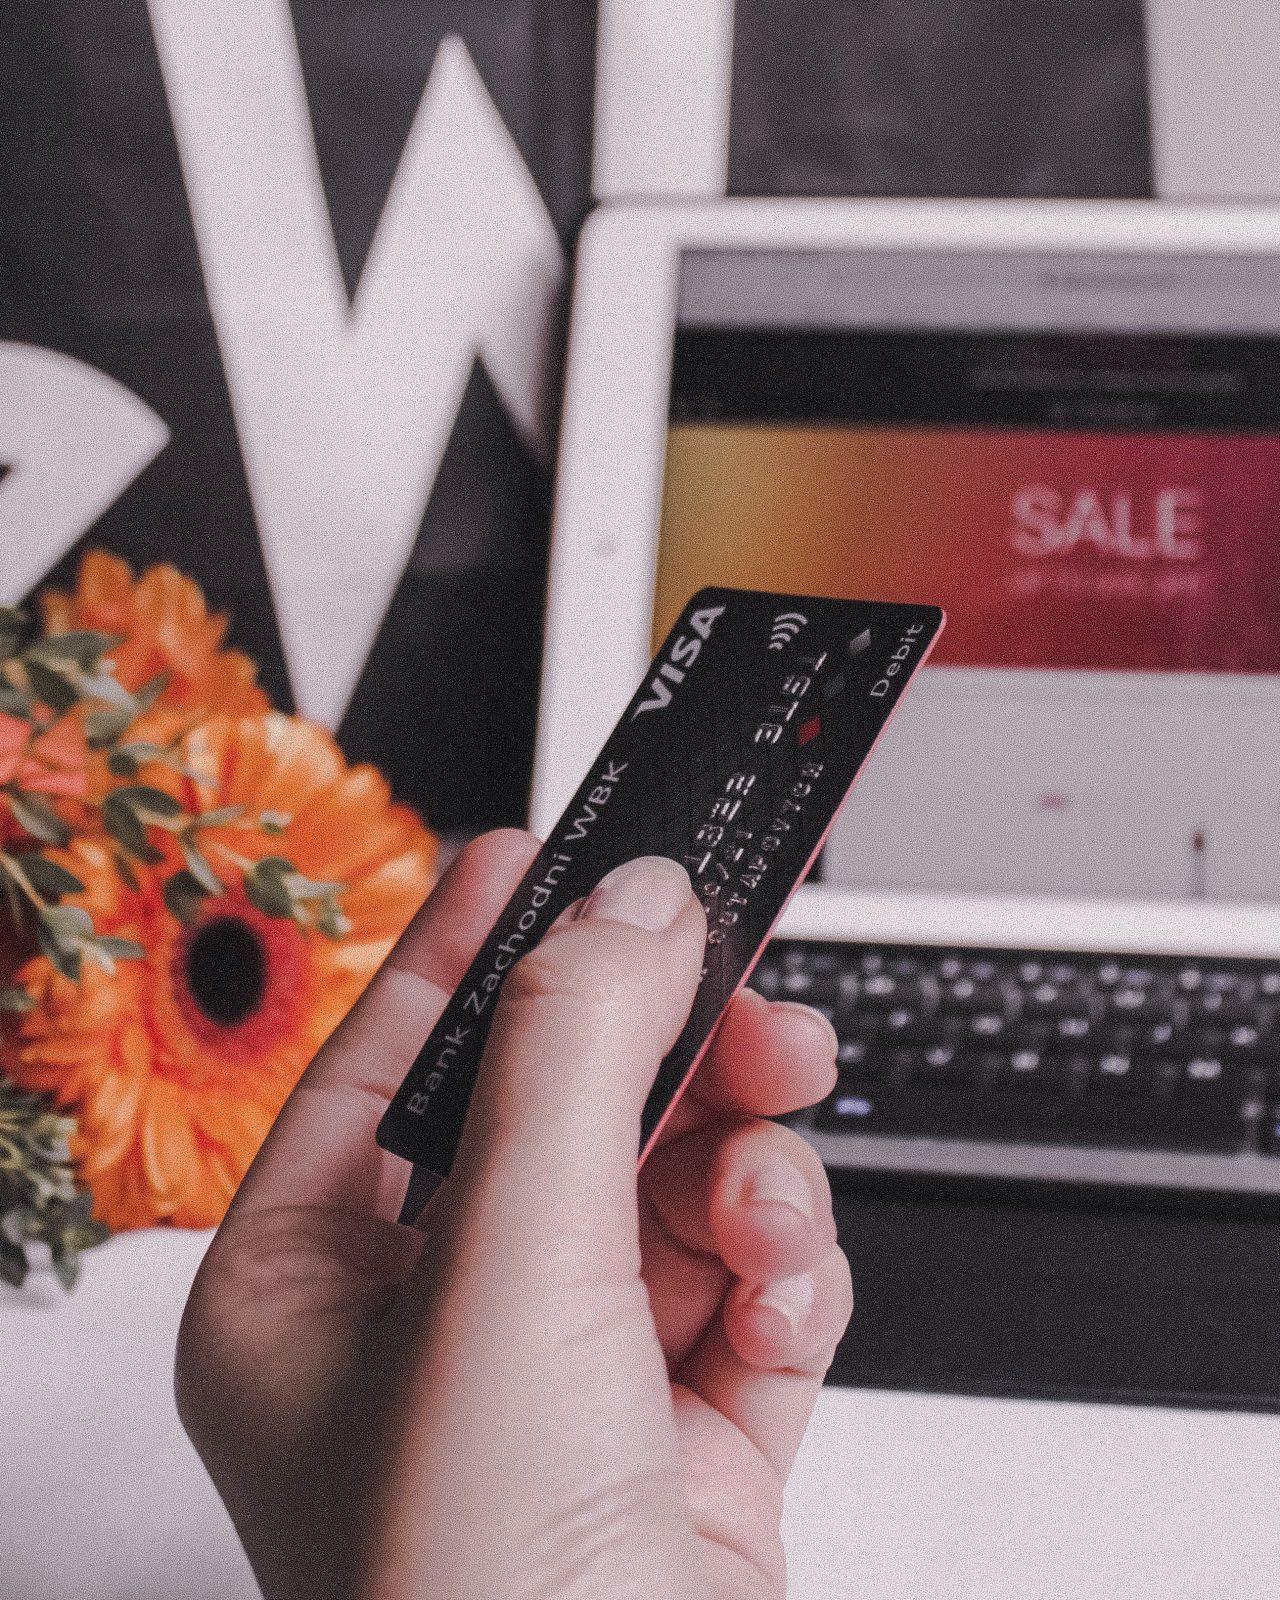 tarjetas vs dinero efectivo